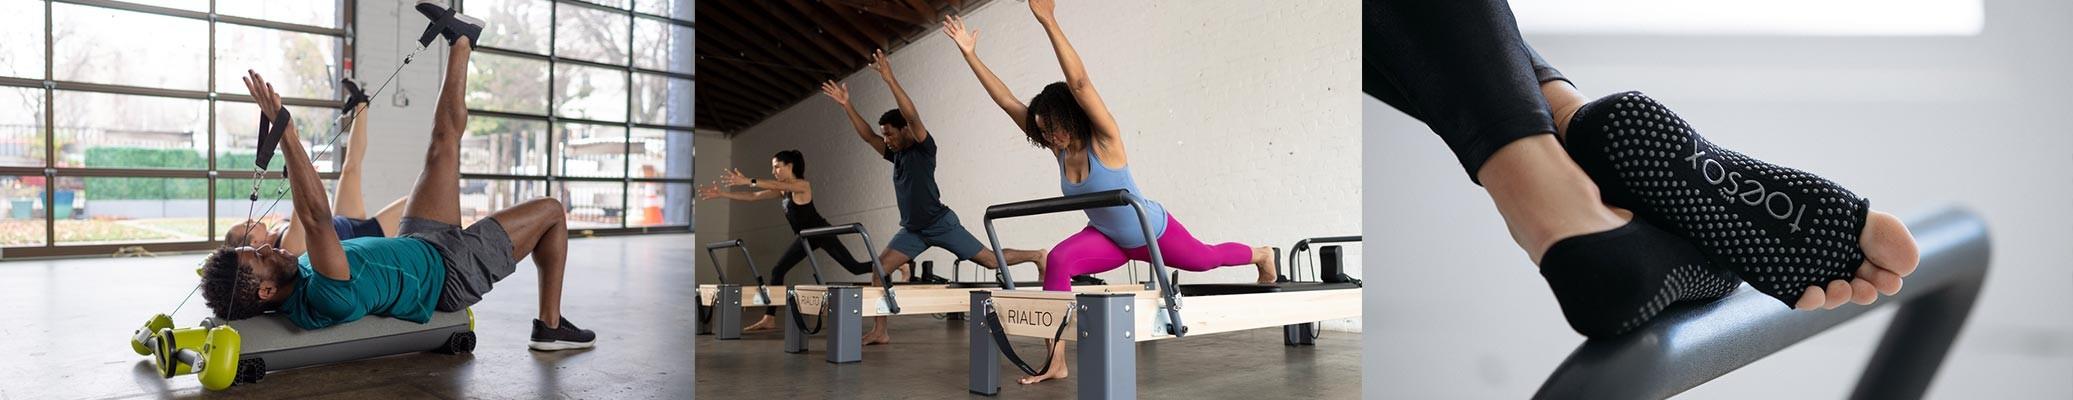 Exerice avec MOTR - Utilisation Reformers pilates - Chaussettes Pilates ToeSox